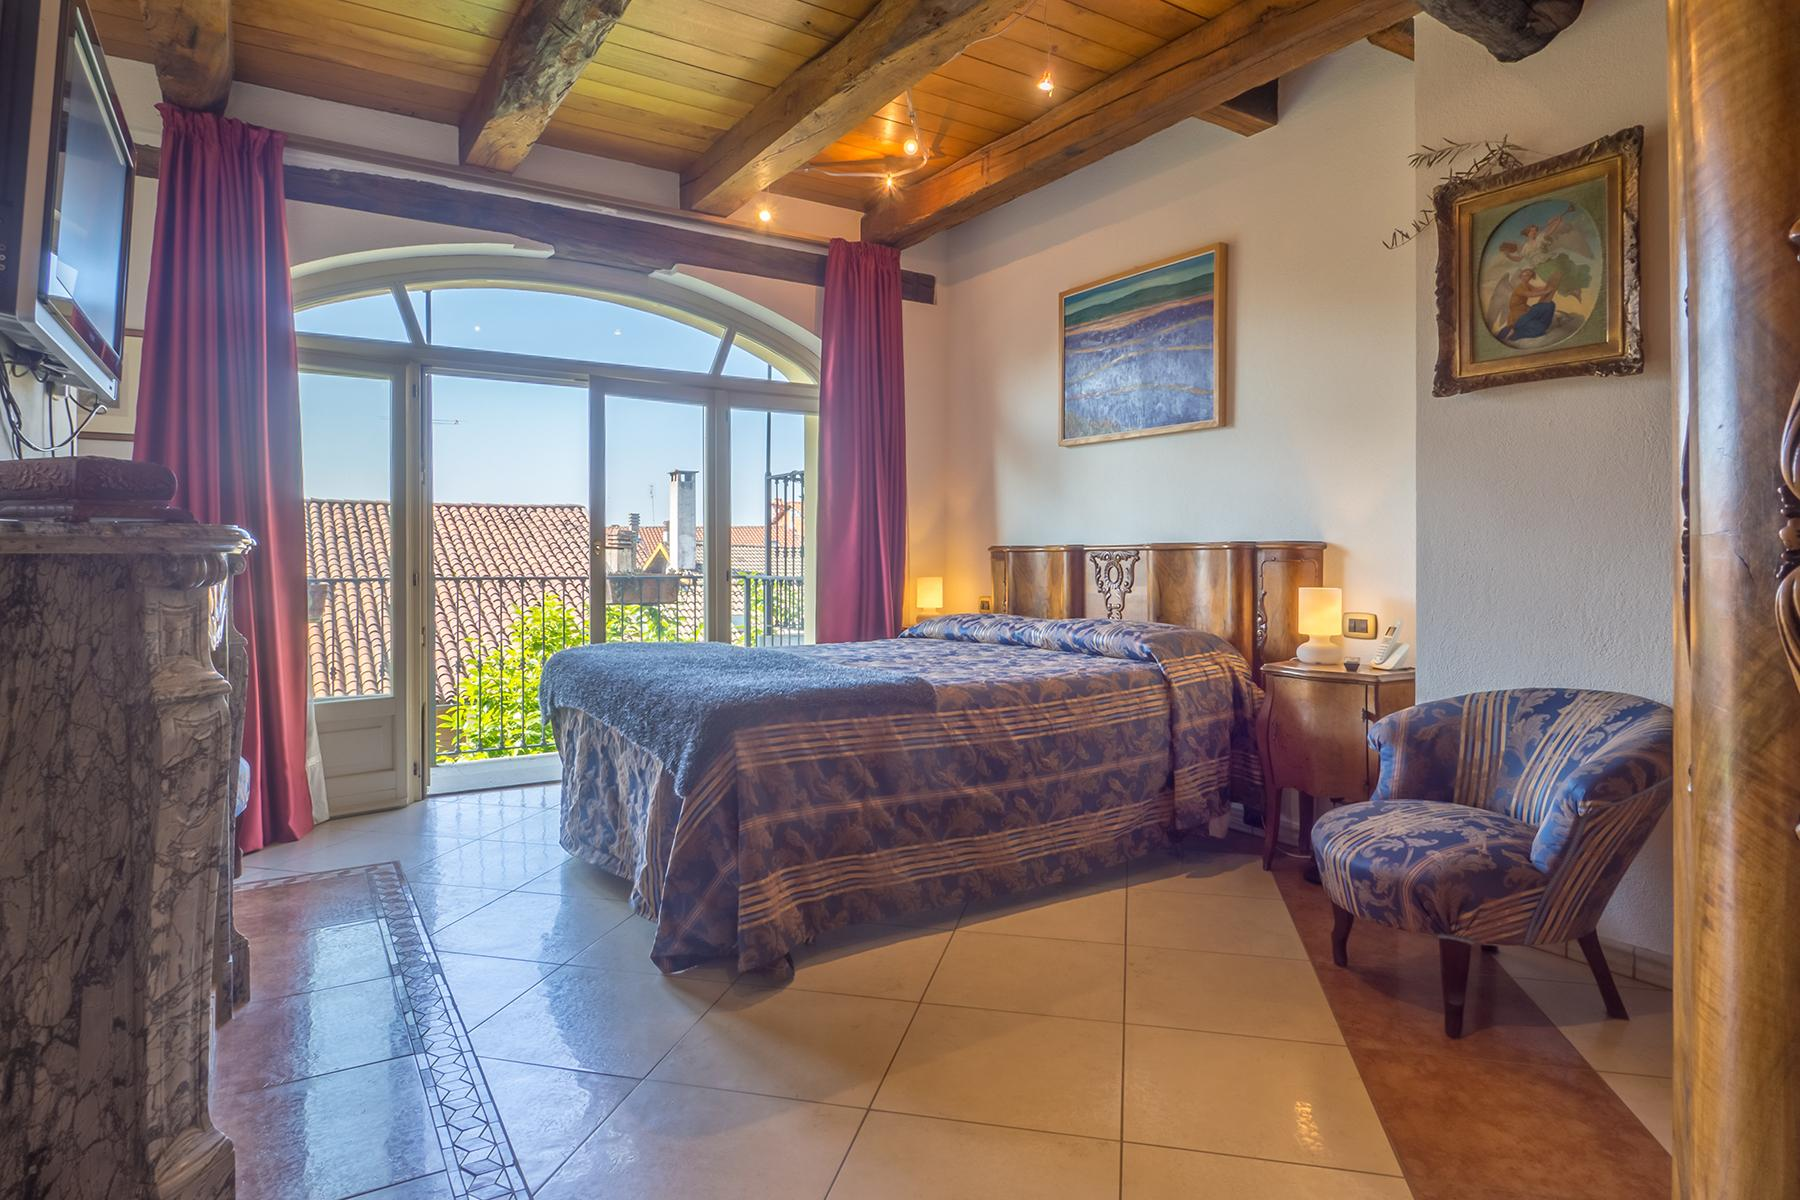 Elegant apartment in the Canavese region - 16